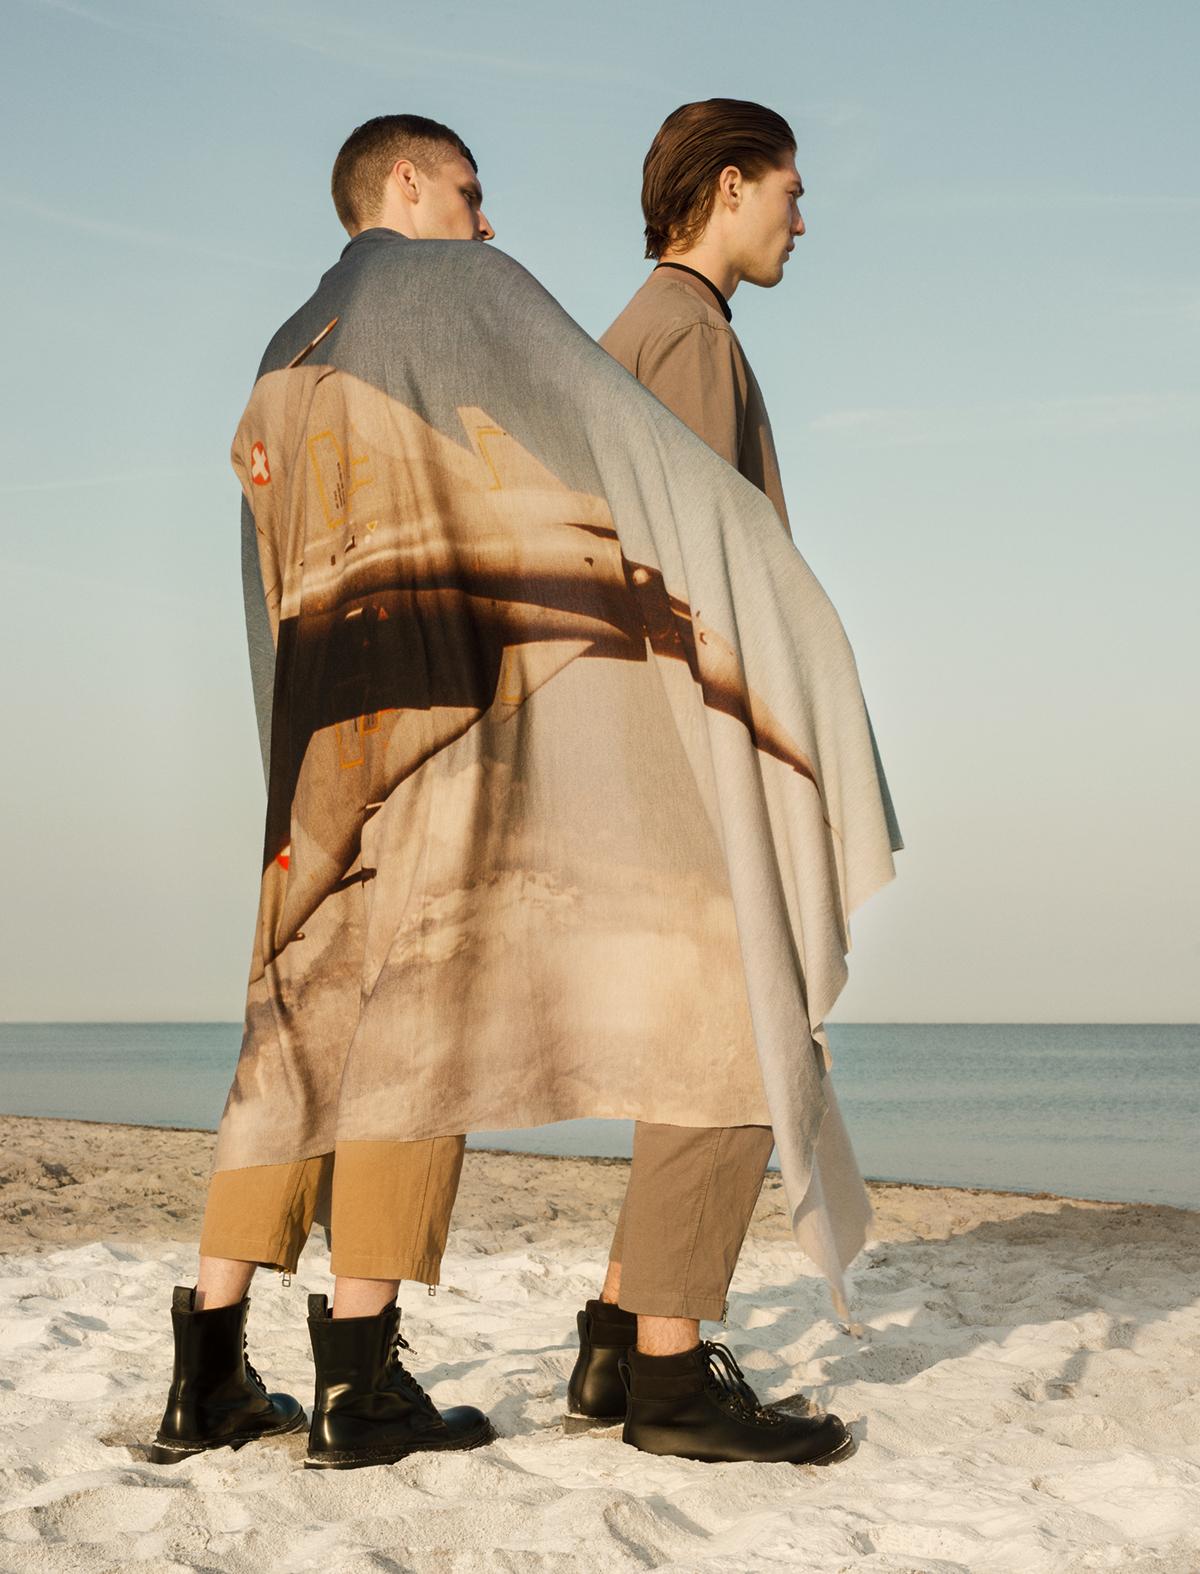 Fashion ,set design ,Photography ,editorial,Seaside,l'officiel hommes,Sabrina Theissen,Christian Stemmler,Kristine Alksne,berlin